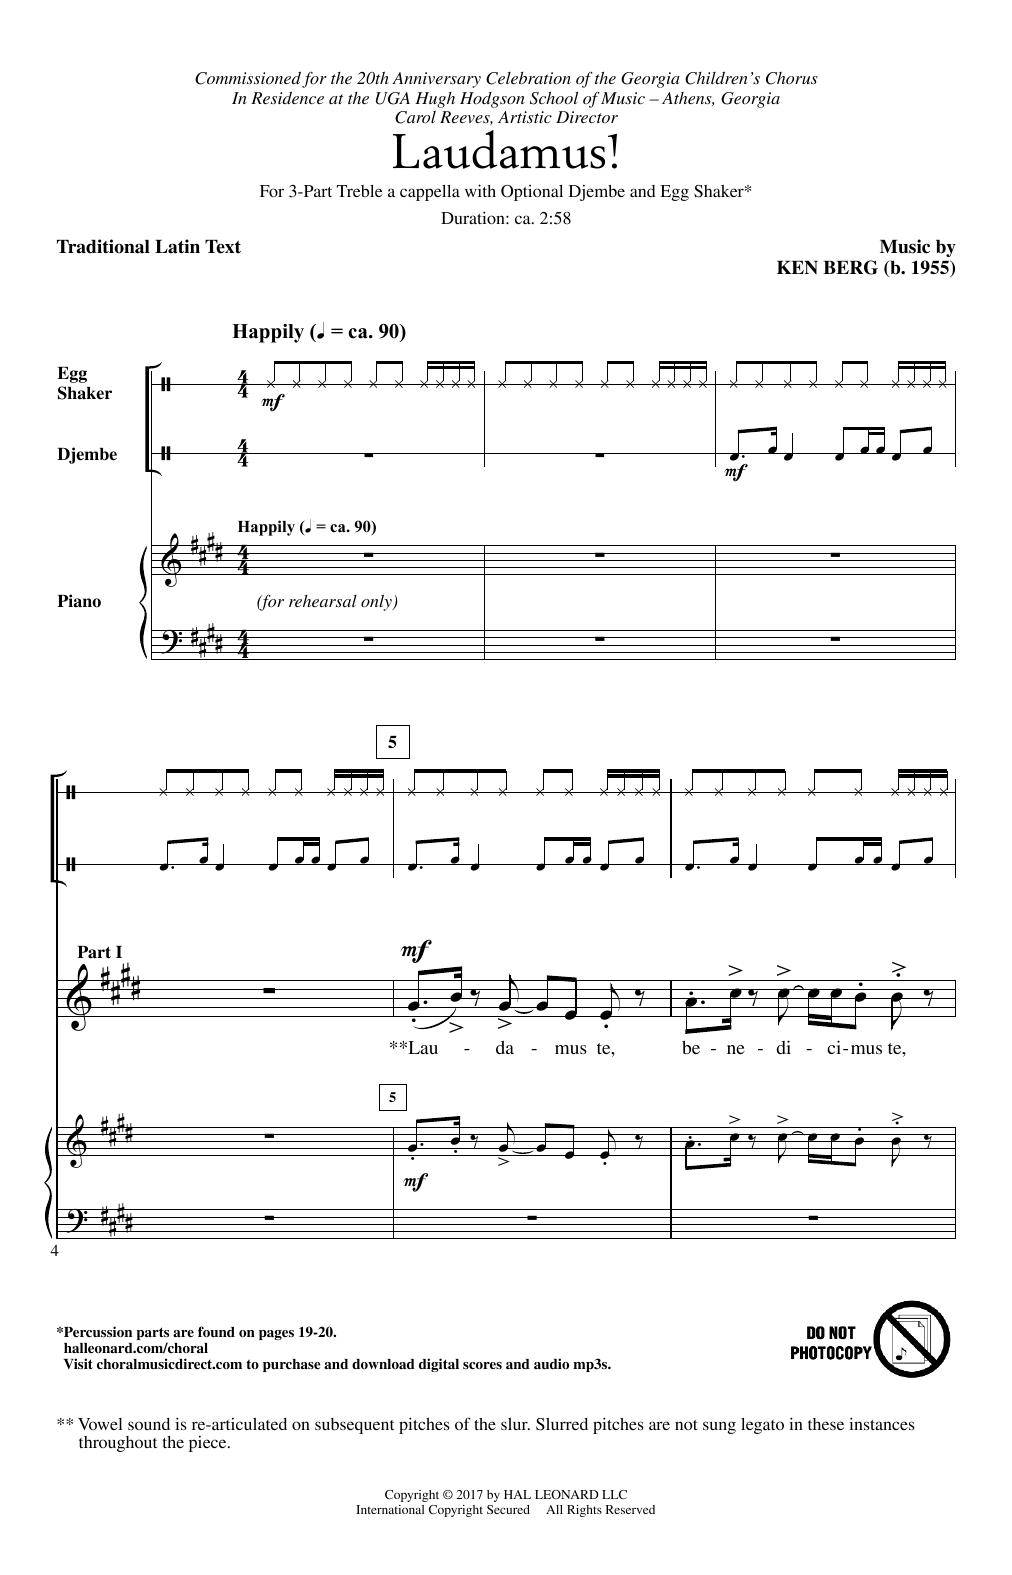 Laudamus! Sheet Music